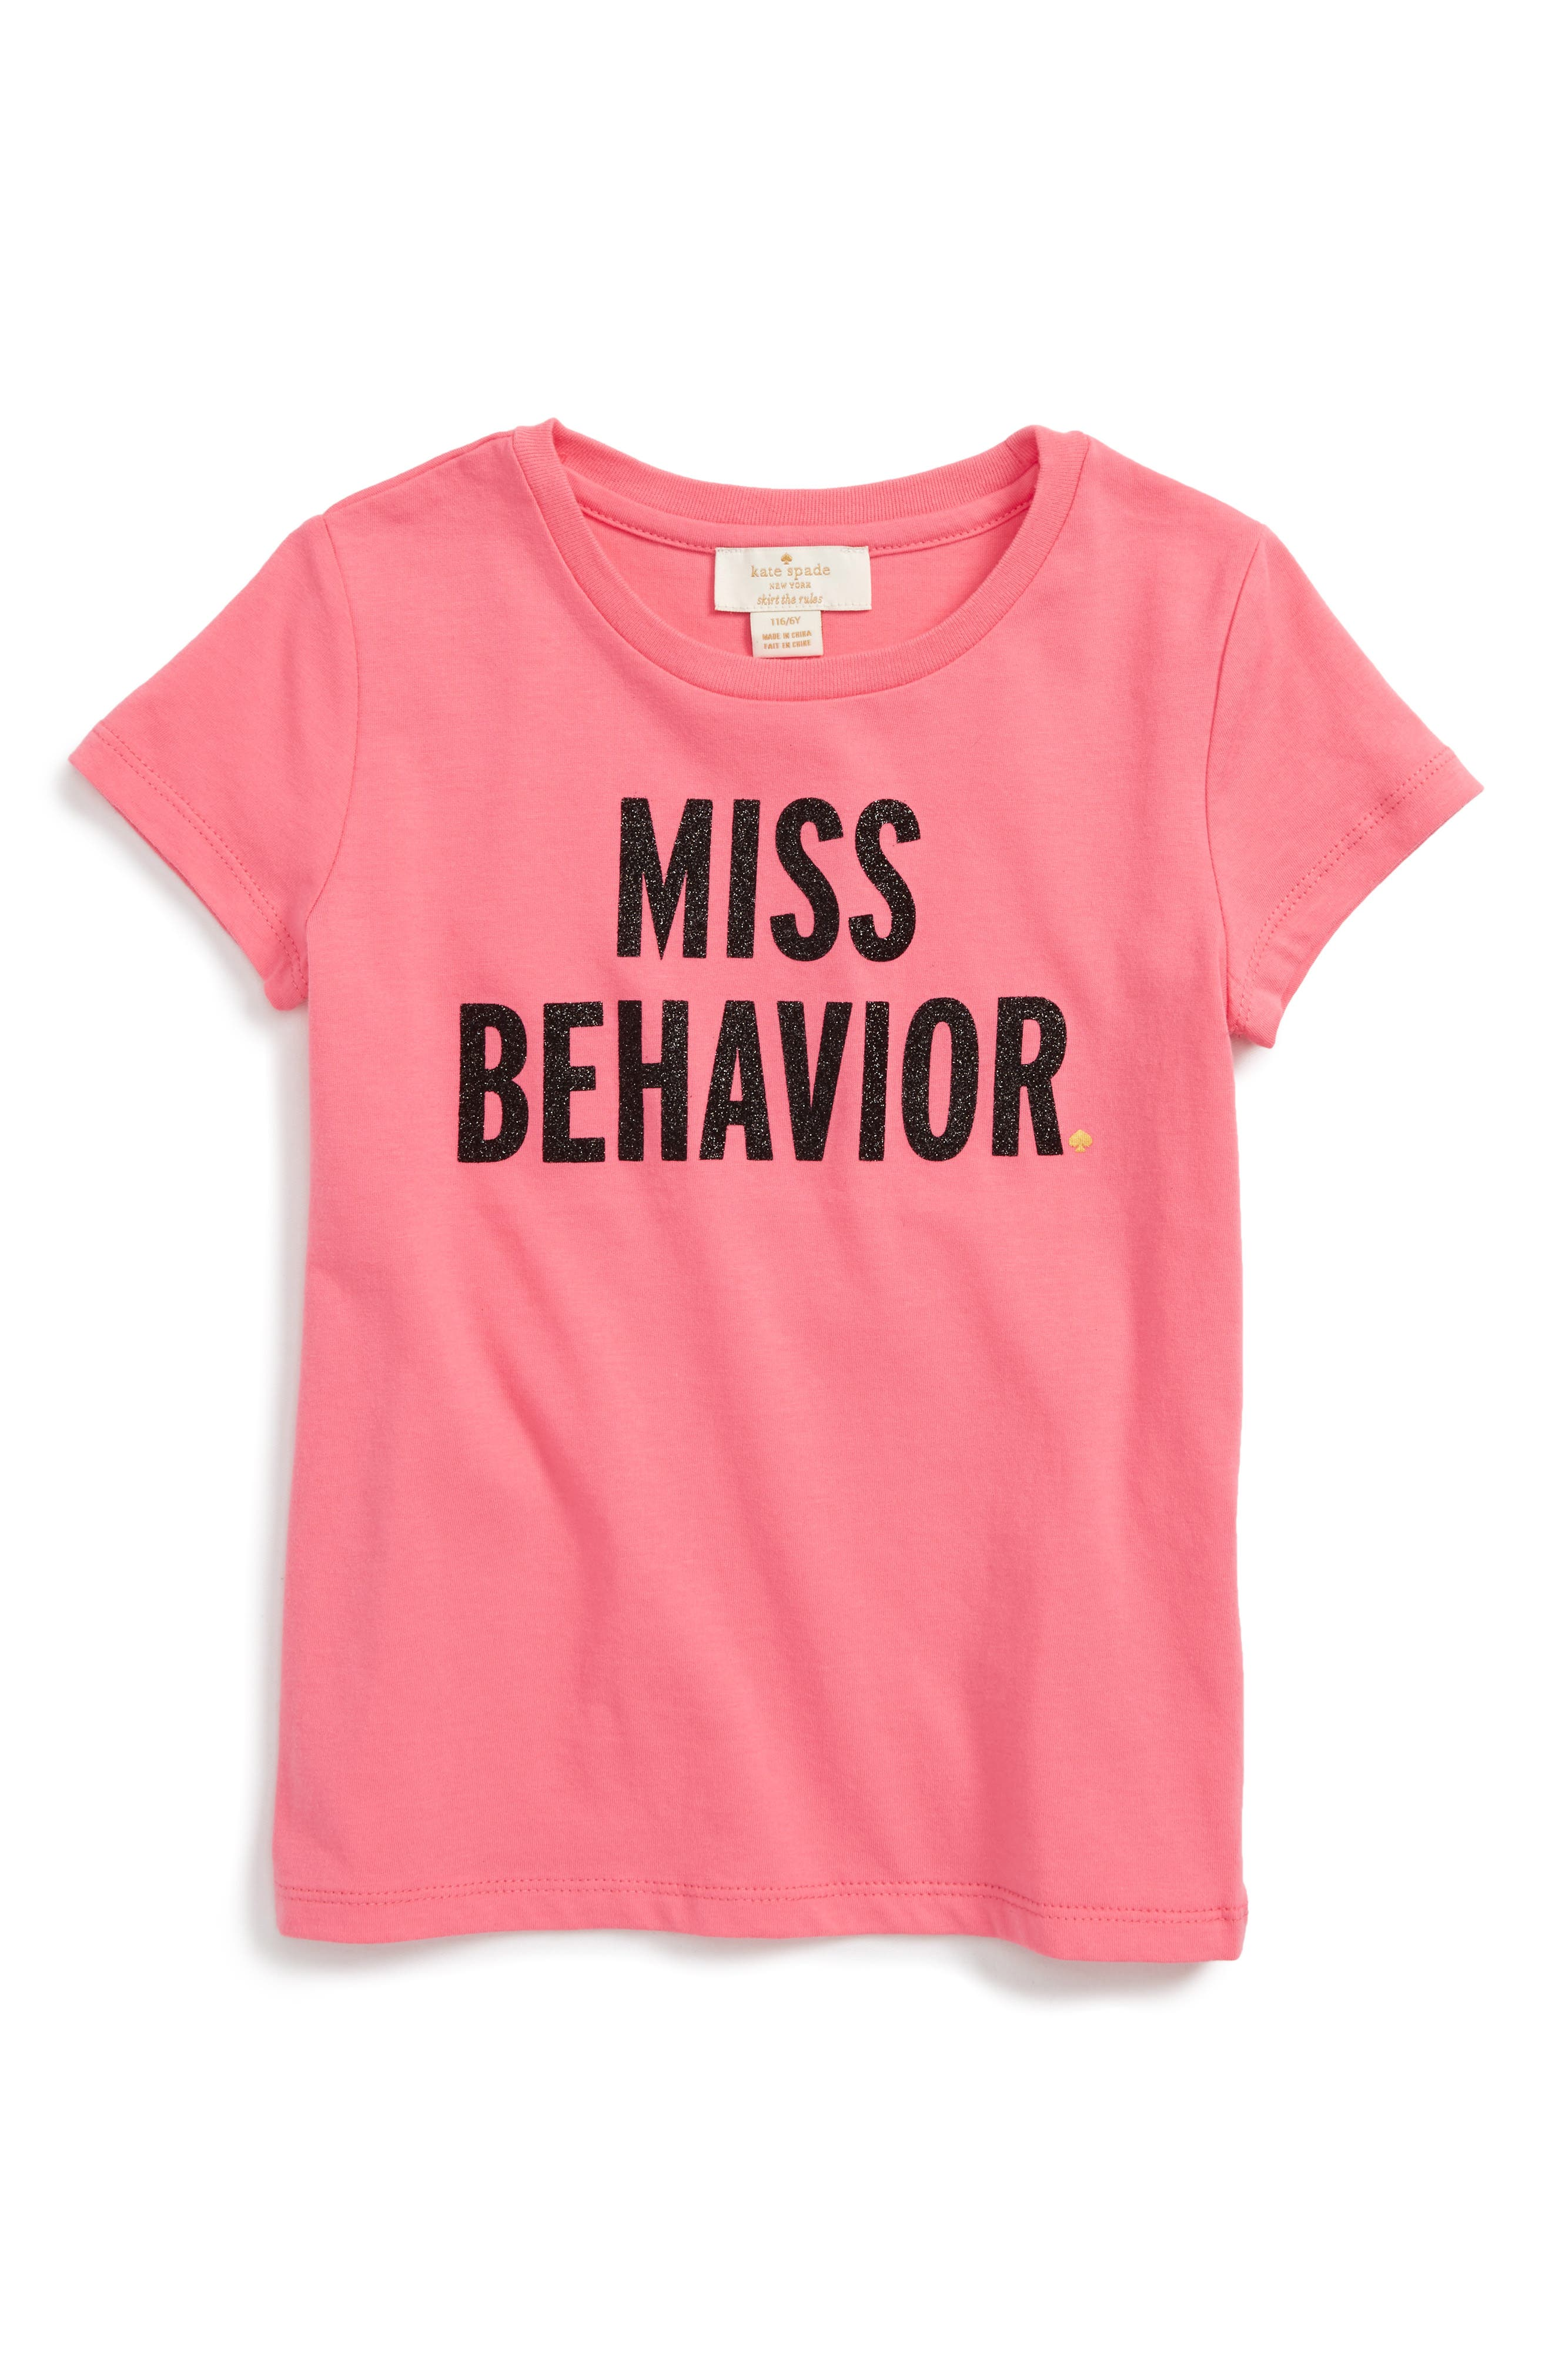 kate spade new york miss behavior graphic tee (Toddler Girls & Little Girls)